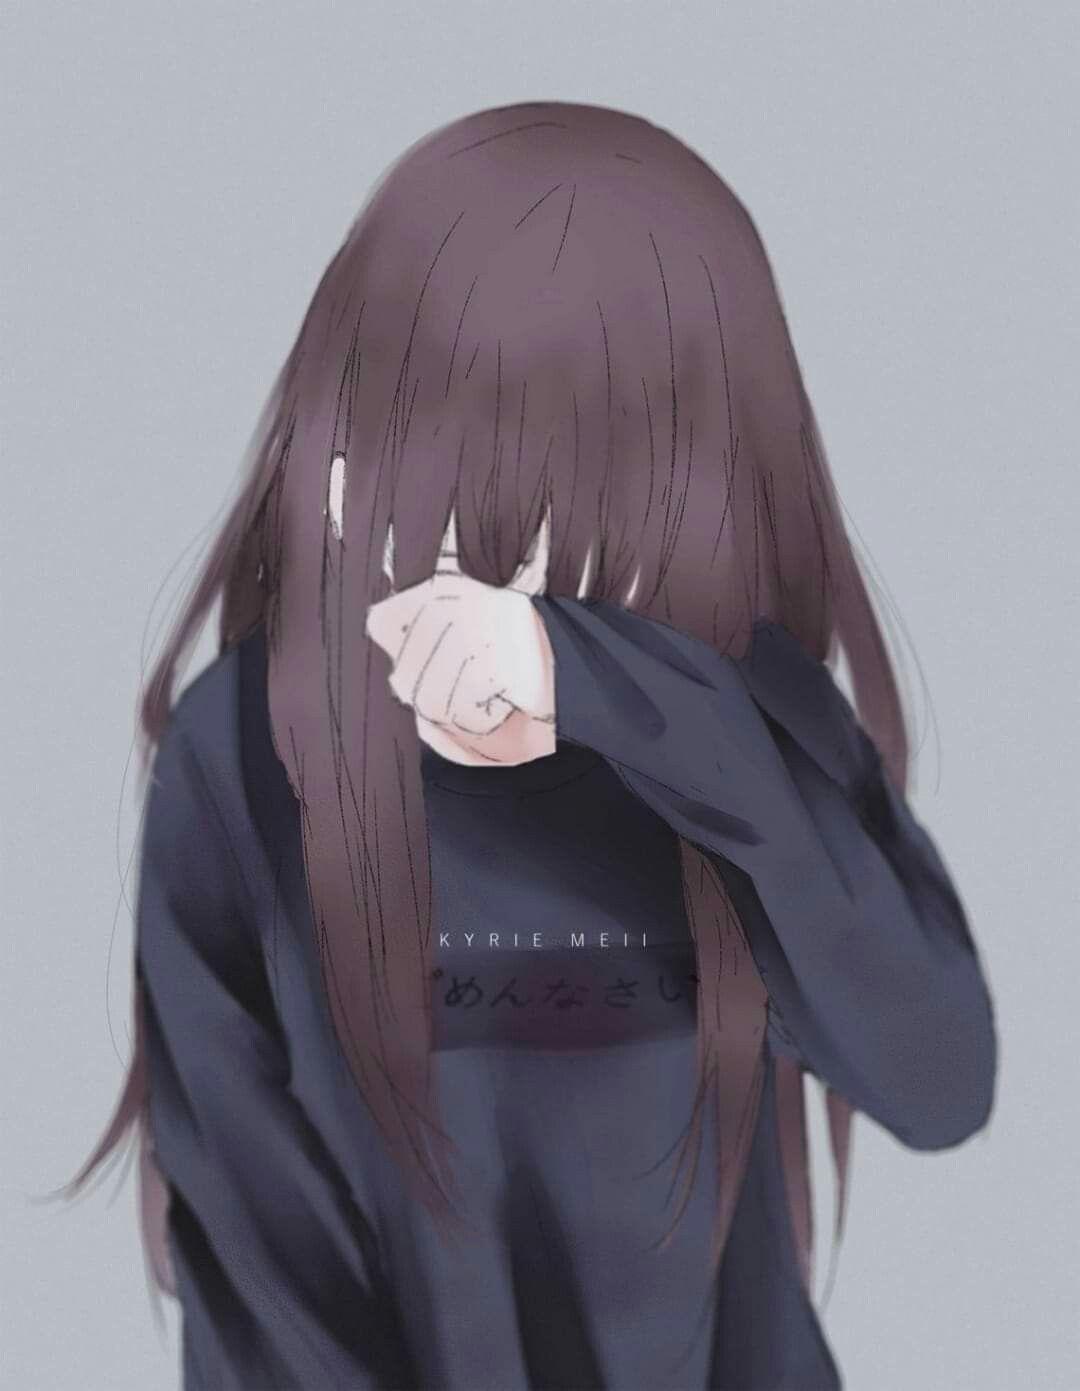 Pin Oleh Santika Zahrul Di Art Words Draw Anime Di 2020 Gambar Anime Gadis Anime Sedih Gadis Animasi